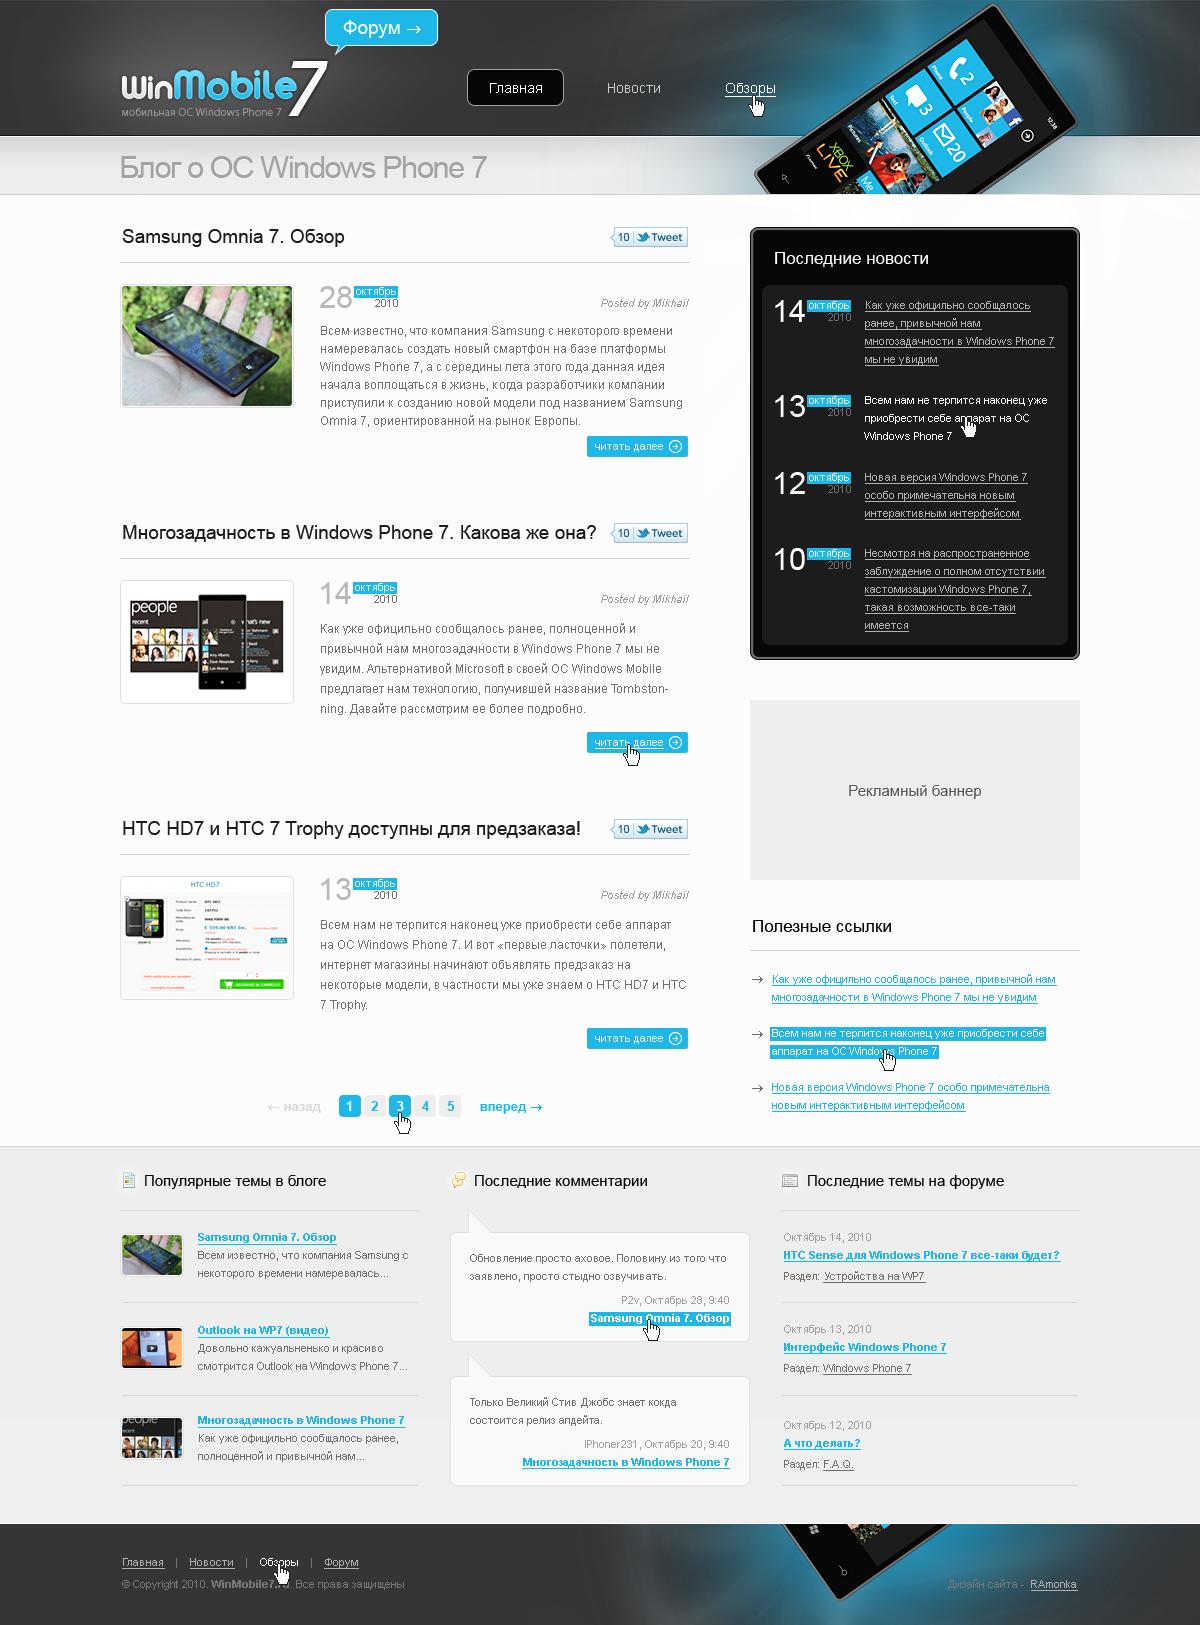 Разработка логотипа и Веб дизайн блога о Windows Phone7